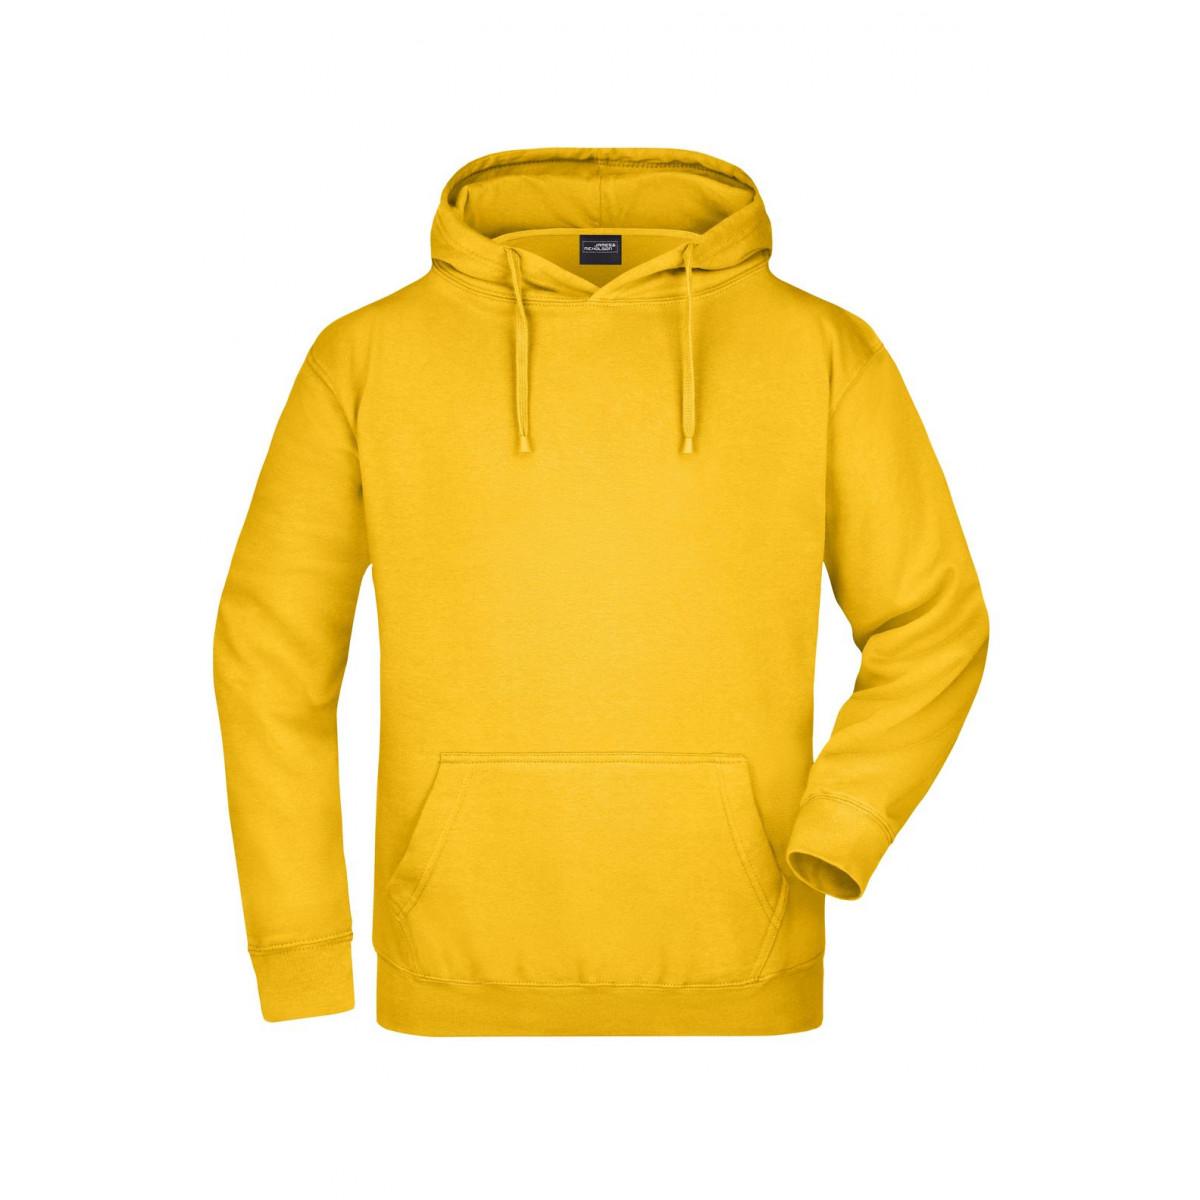 Толстовка мужская JN047 Hooded Sweat - Золоистый желтый